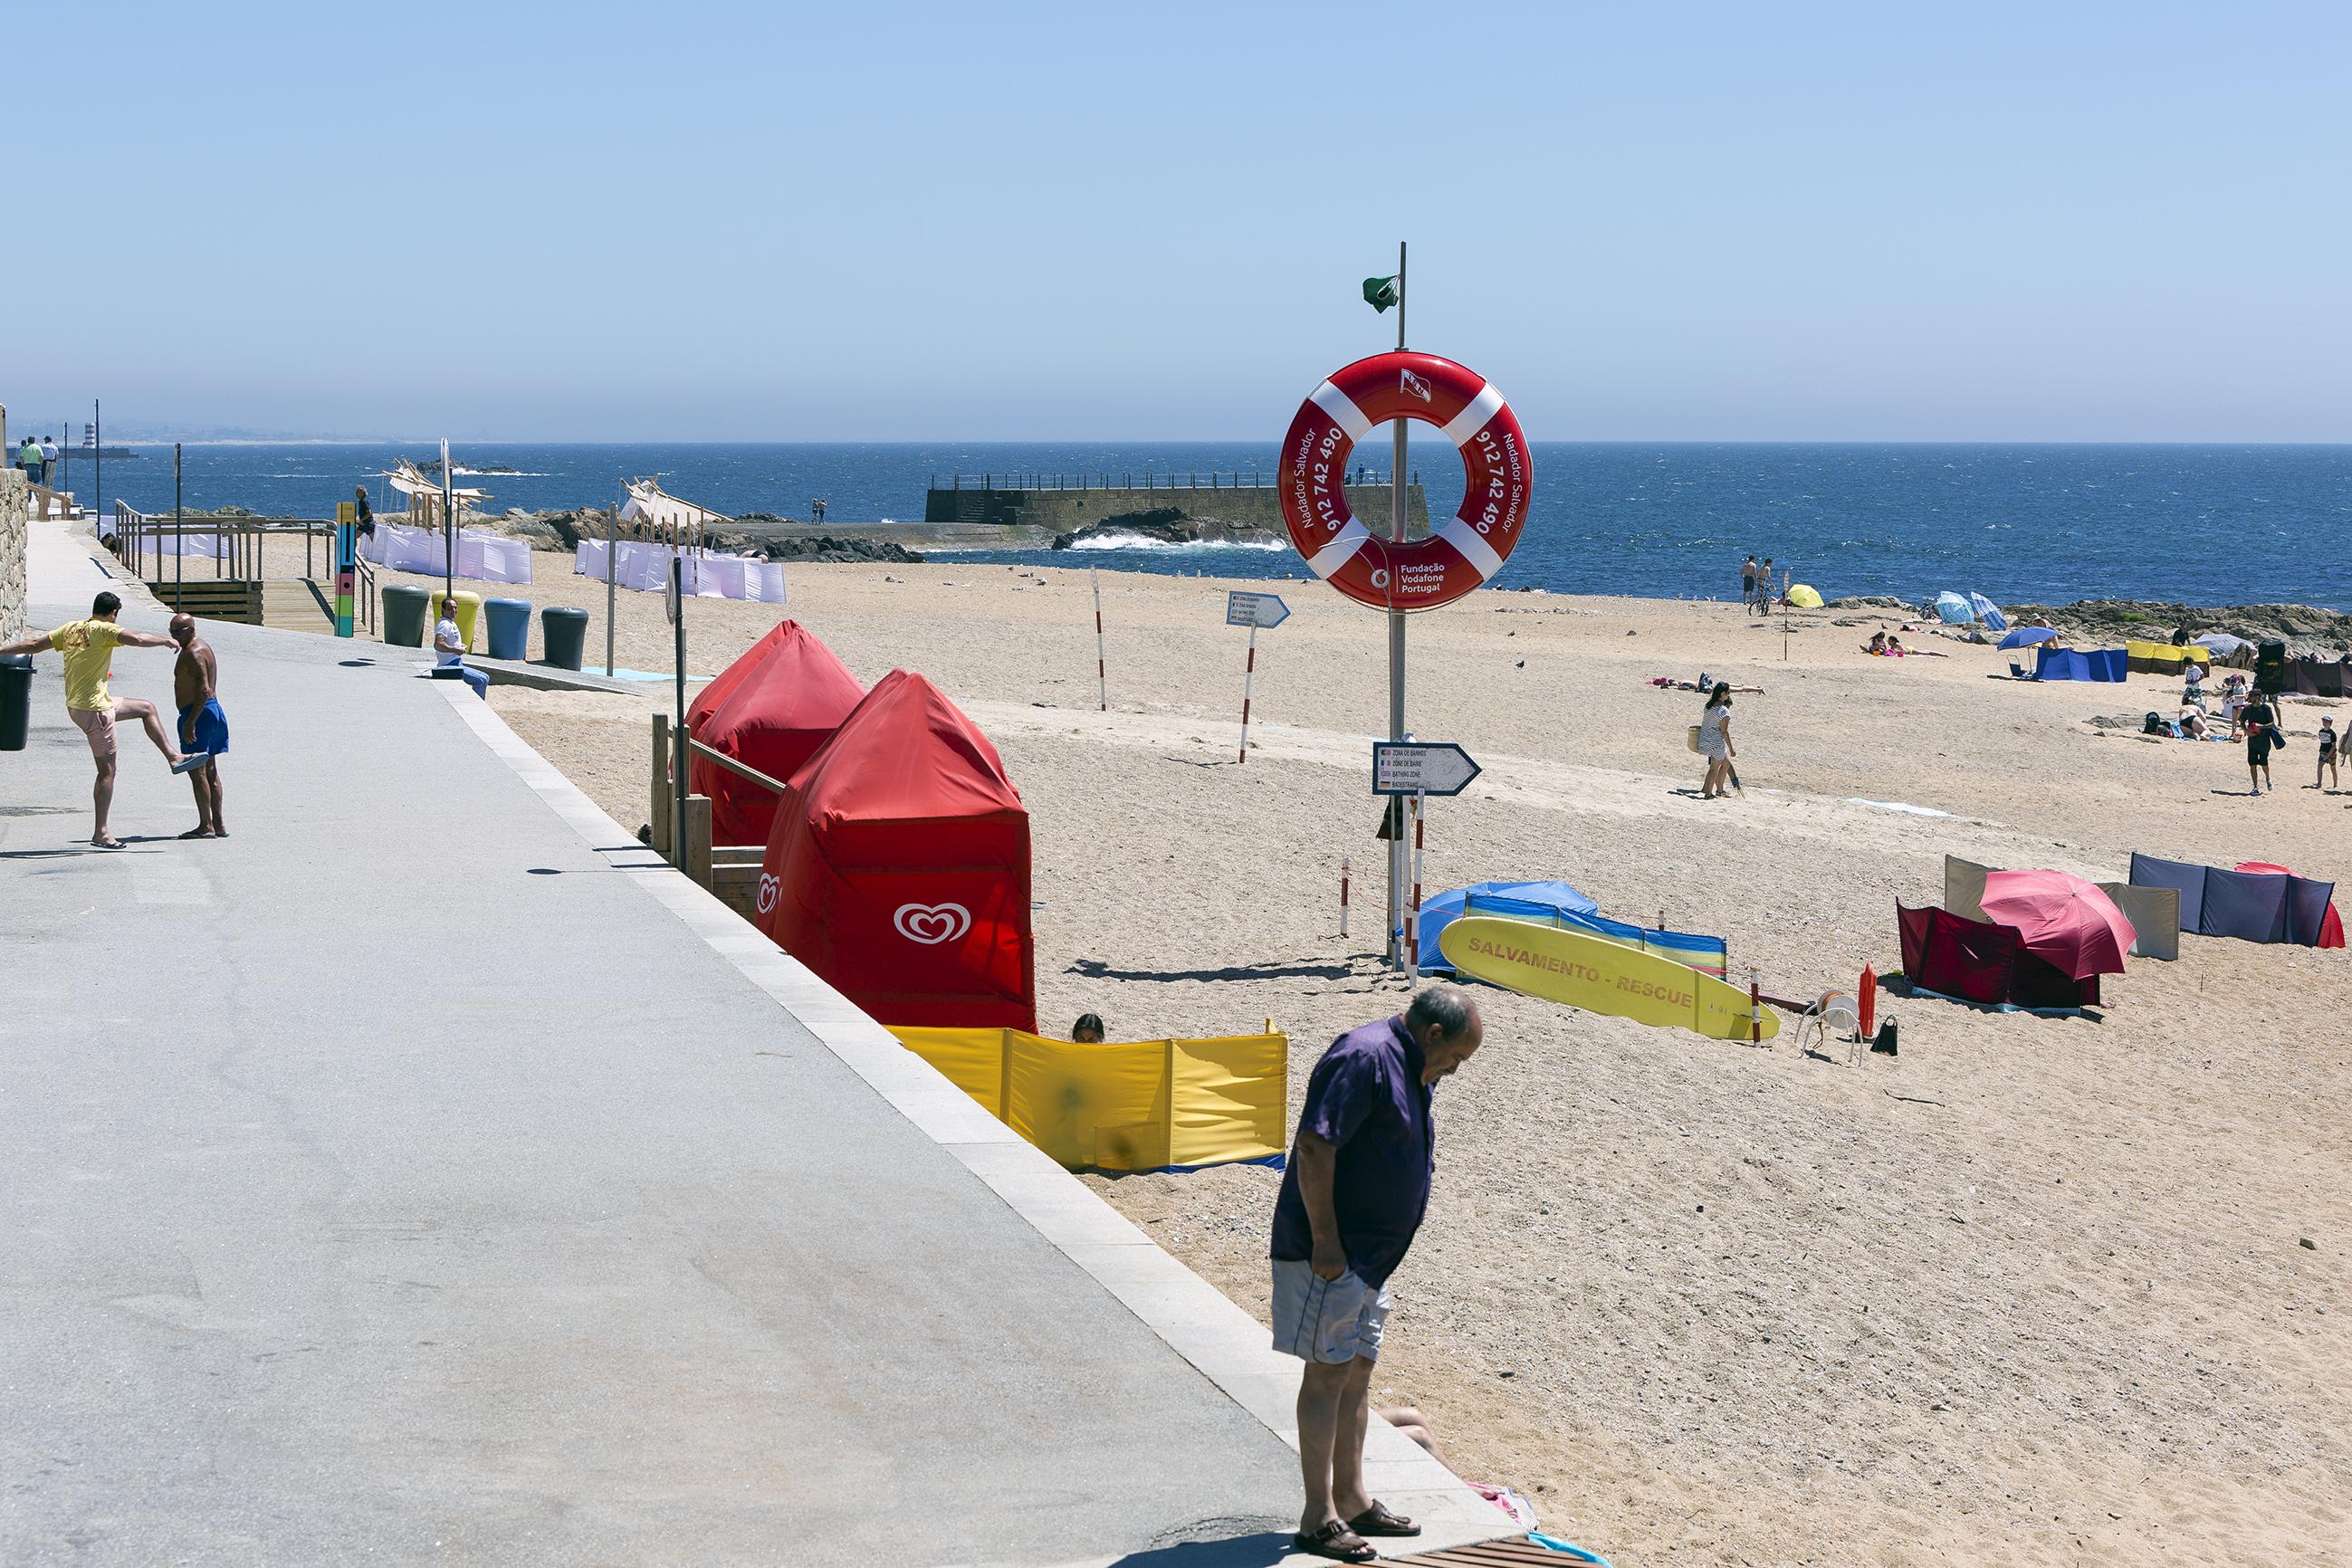 Praia do Homem do Leme